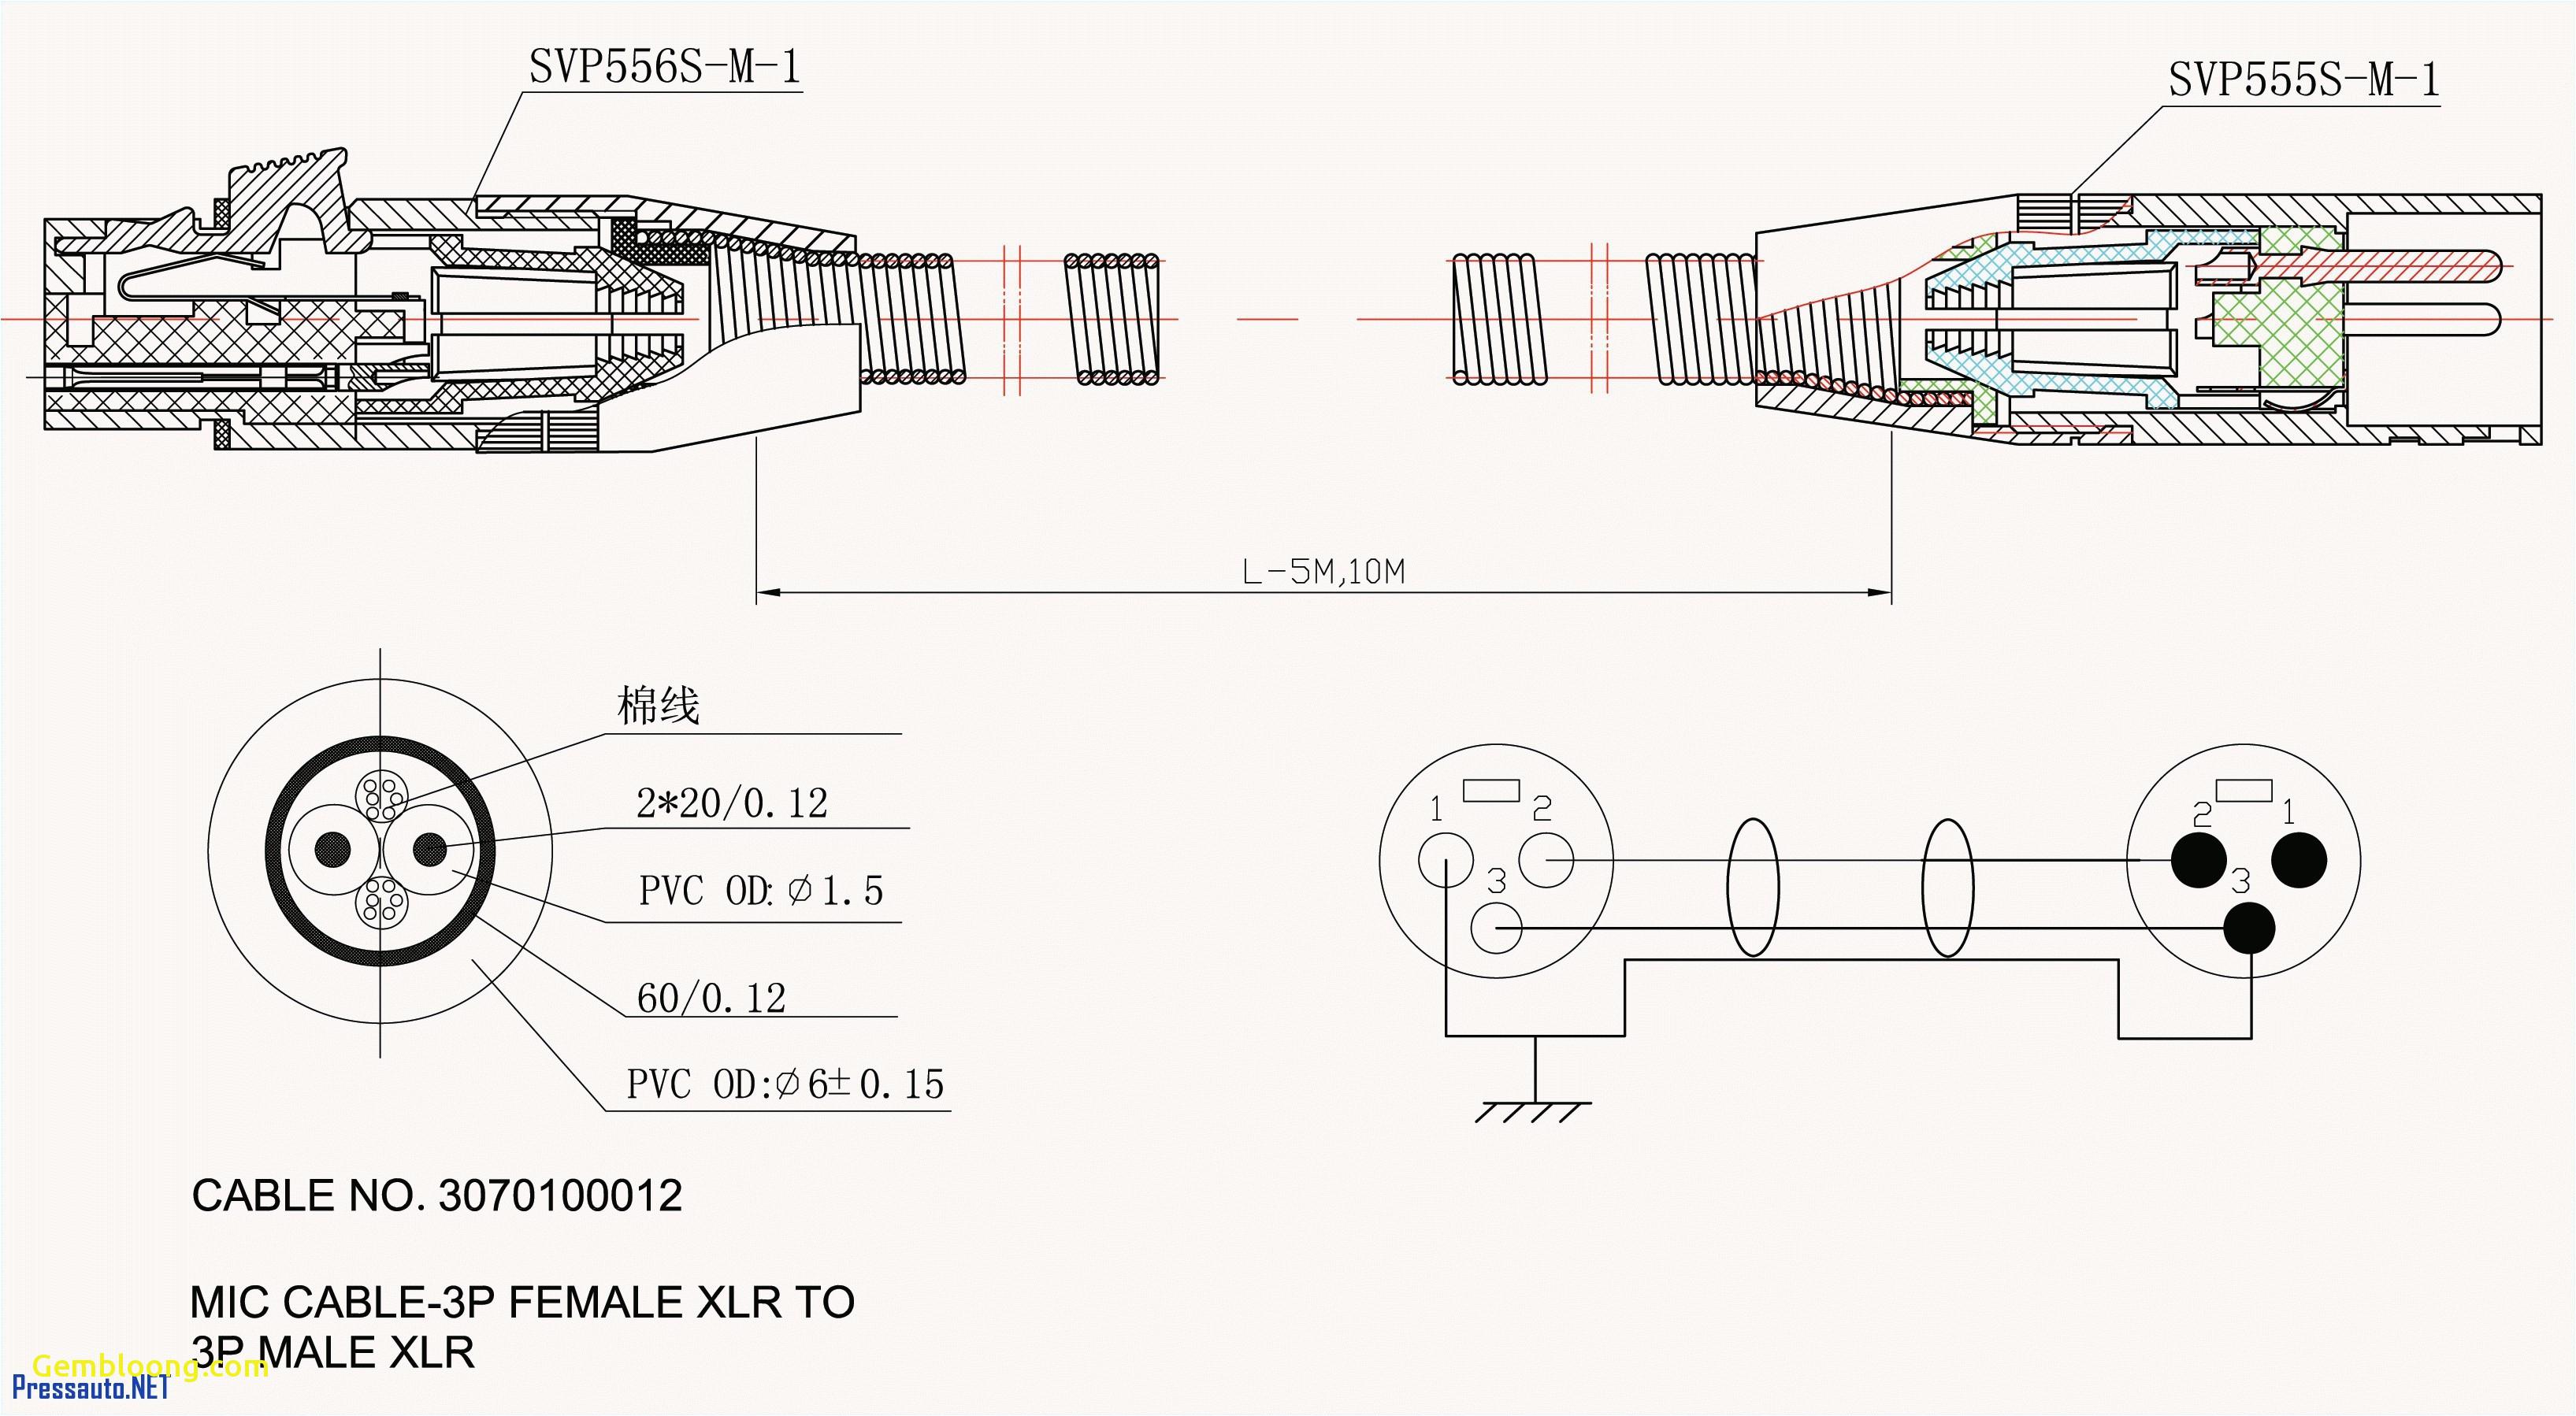 [SCHEMATICS_4CA]  207 Dodge Alternator Wiring Diagram. alternator wiring diagram parts  autocardesign. 2007 dodge nitro wiring used for alternator and battery.  2007 dodge sprinter 2500 harness wiring battery. 68004760ae dodge wiring  battery positive 136 | 207 Dodge Alternator Wiring Diagram |  | 2002-acura-tl-radio.info